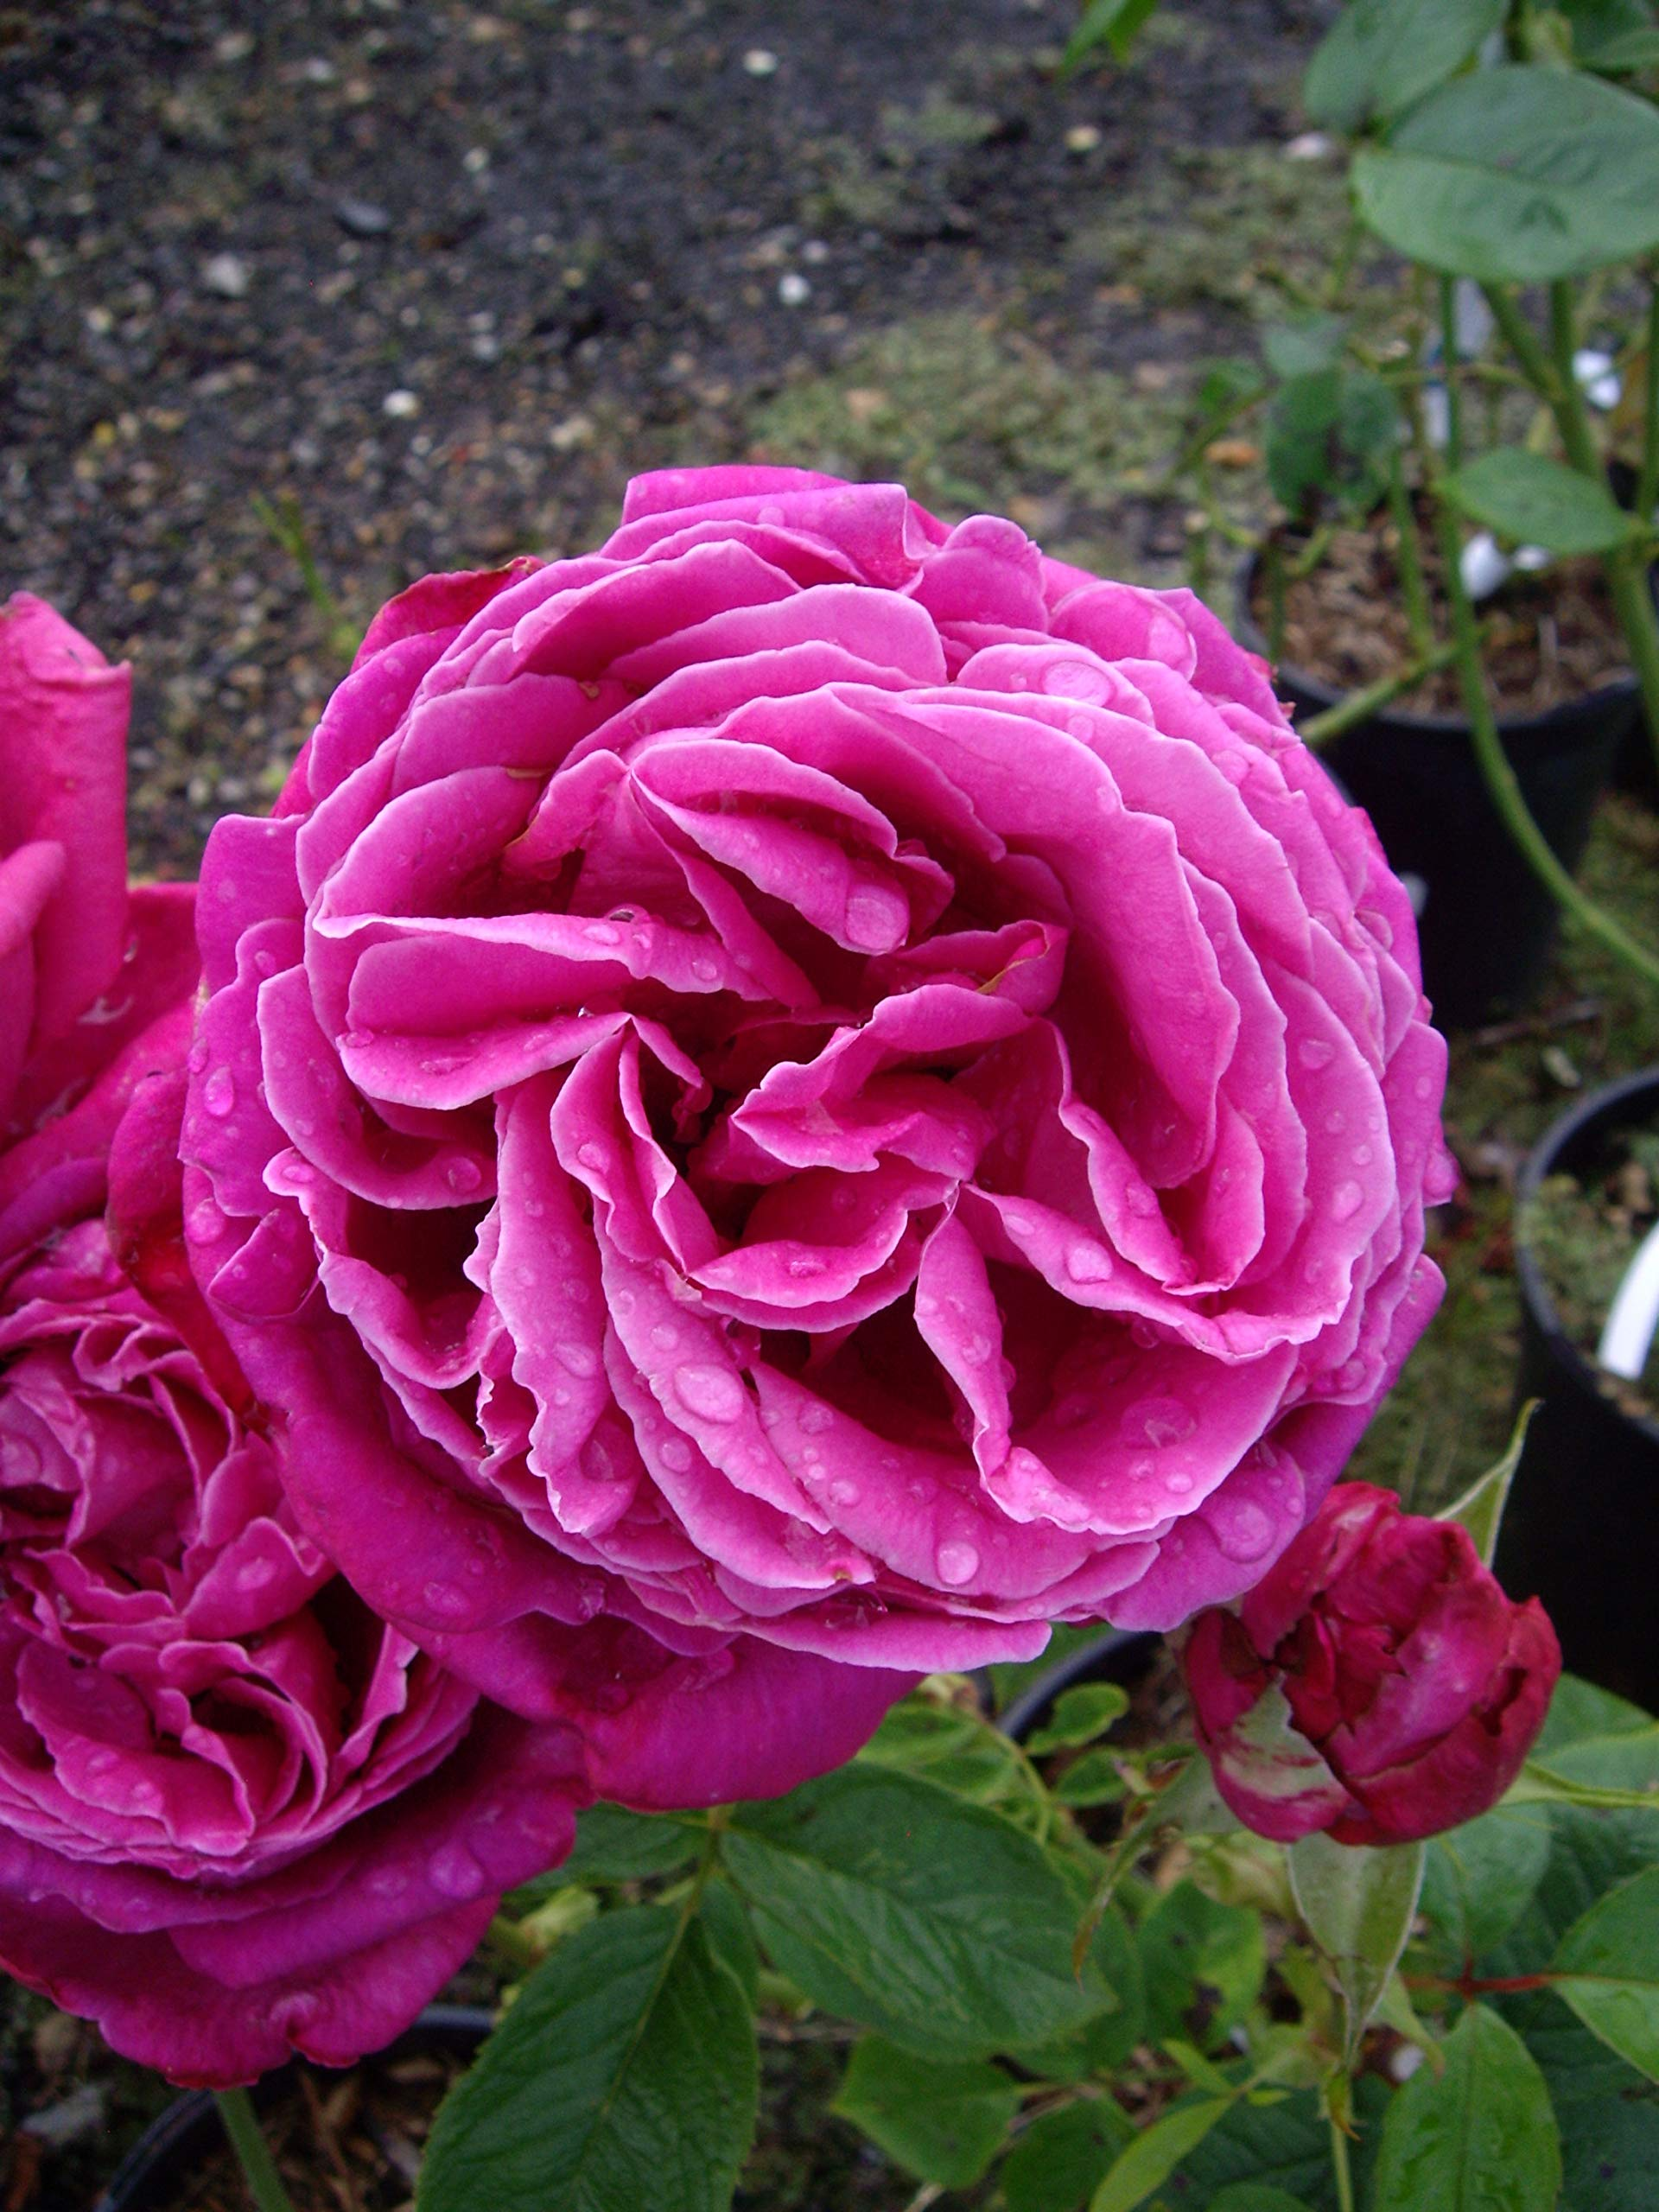 ROSE BIRTHDAY BOY Ideal Plant Flower Birthday Gift For MenHim